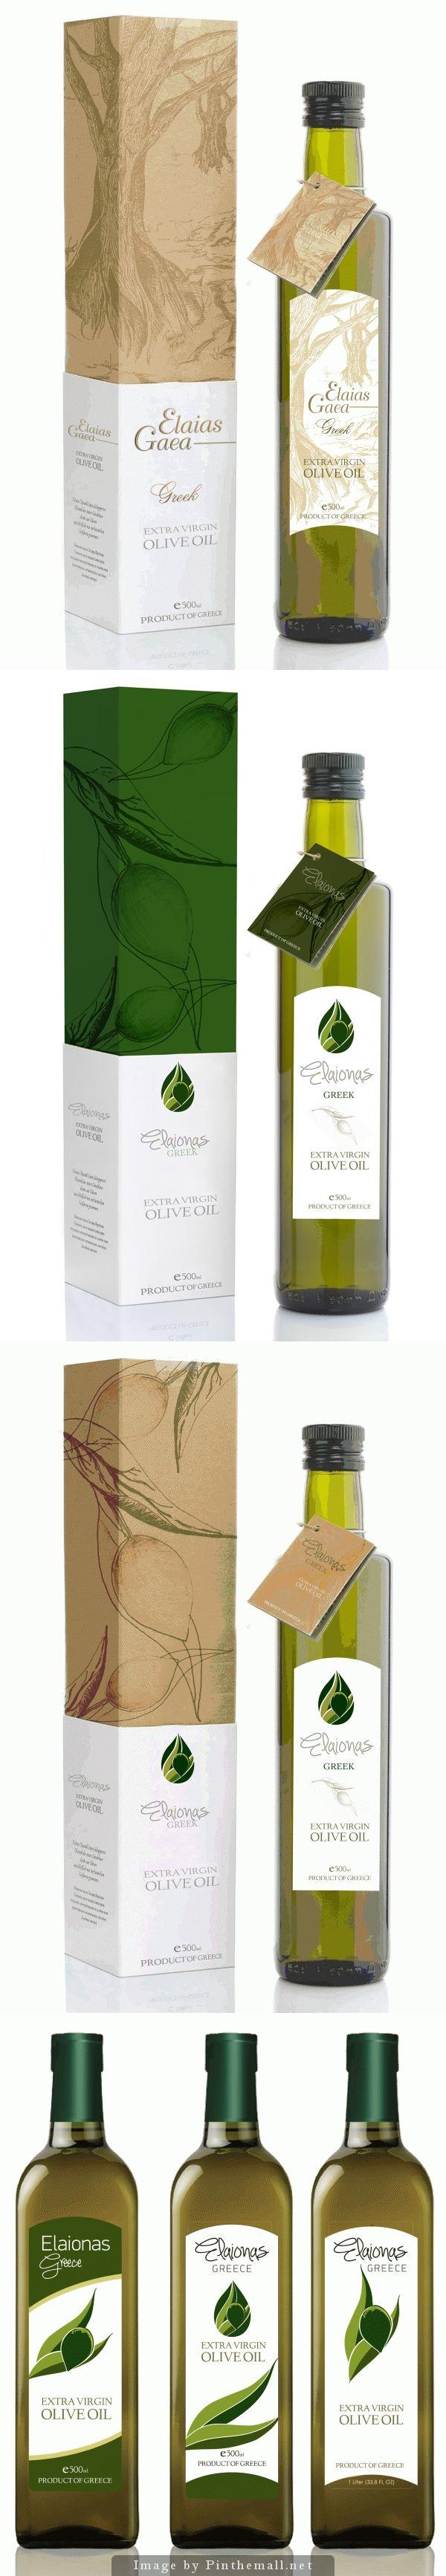 Elaionas Olive Oil